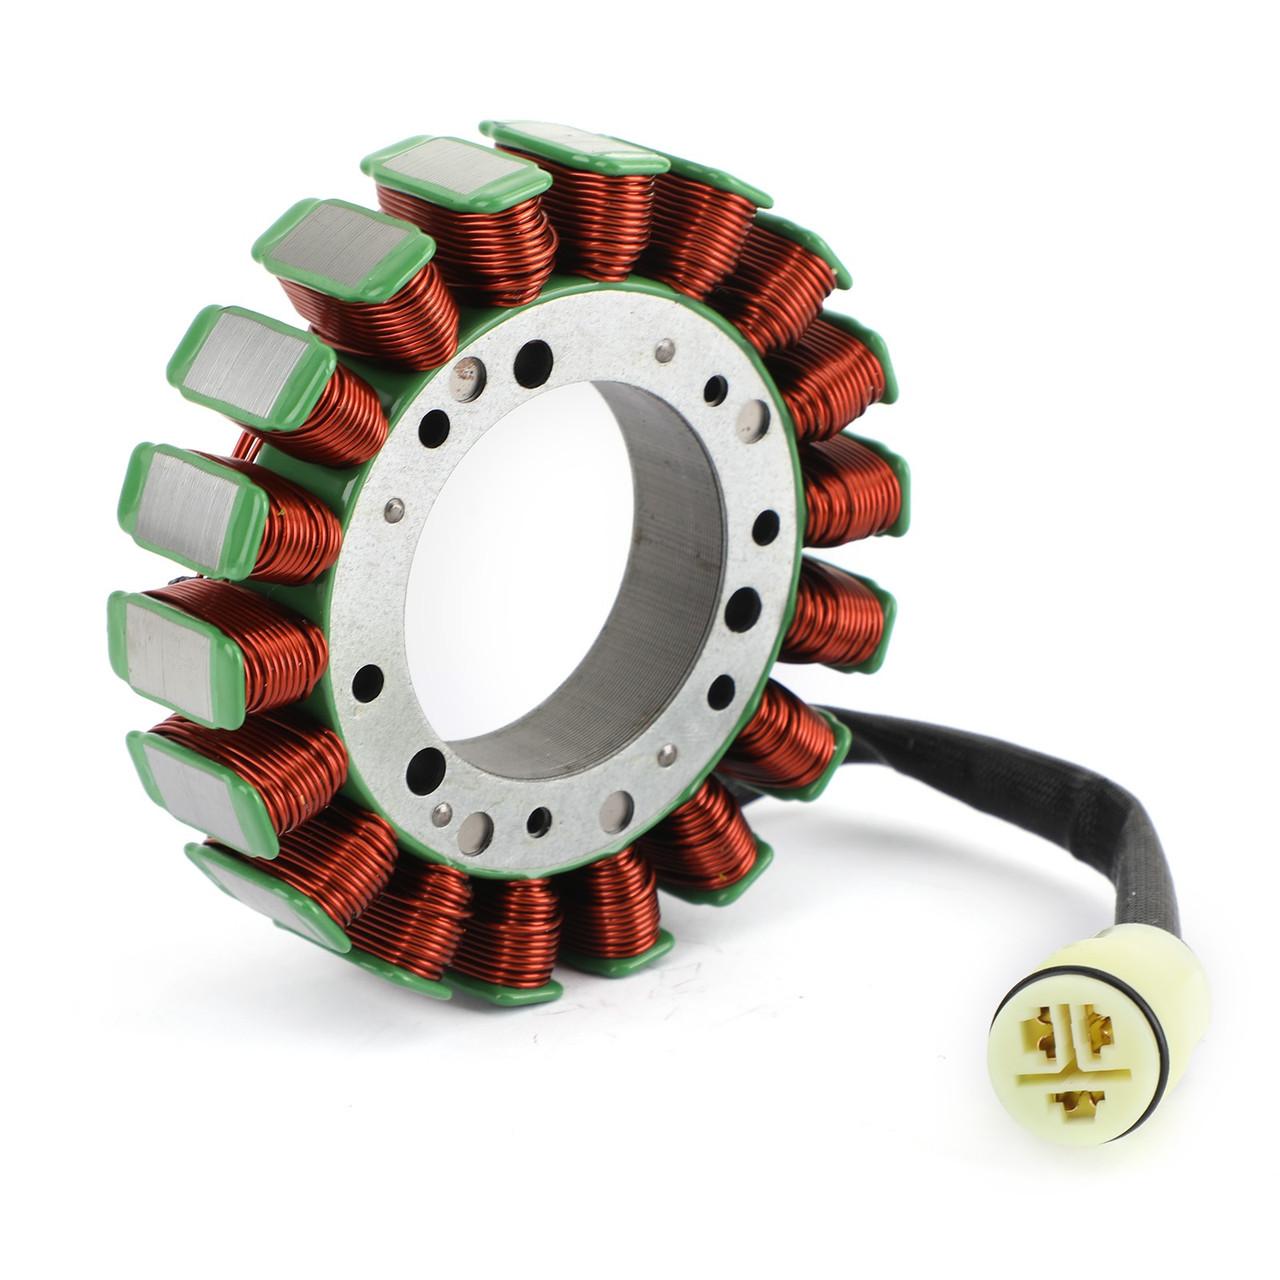 Magneto Generator Engine Stator Fit For Honda BF 75 90 75hp 90hp 97-06